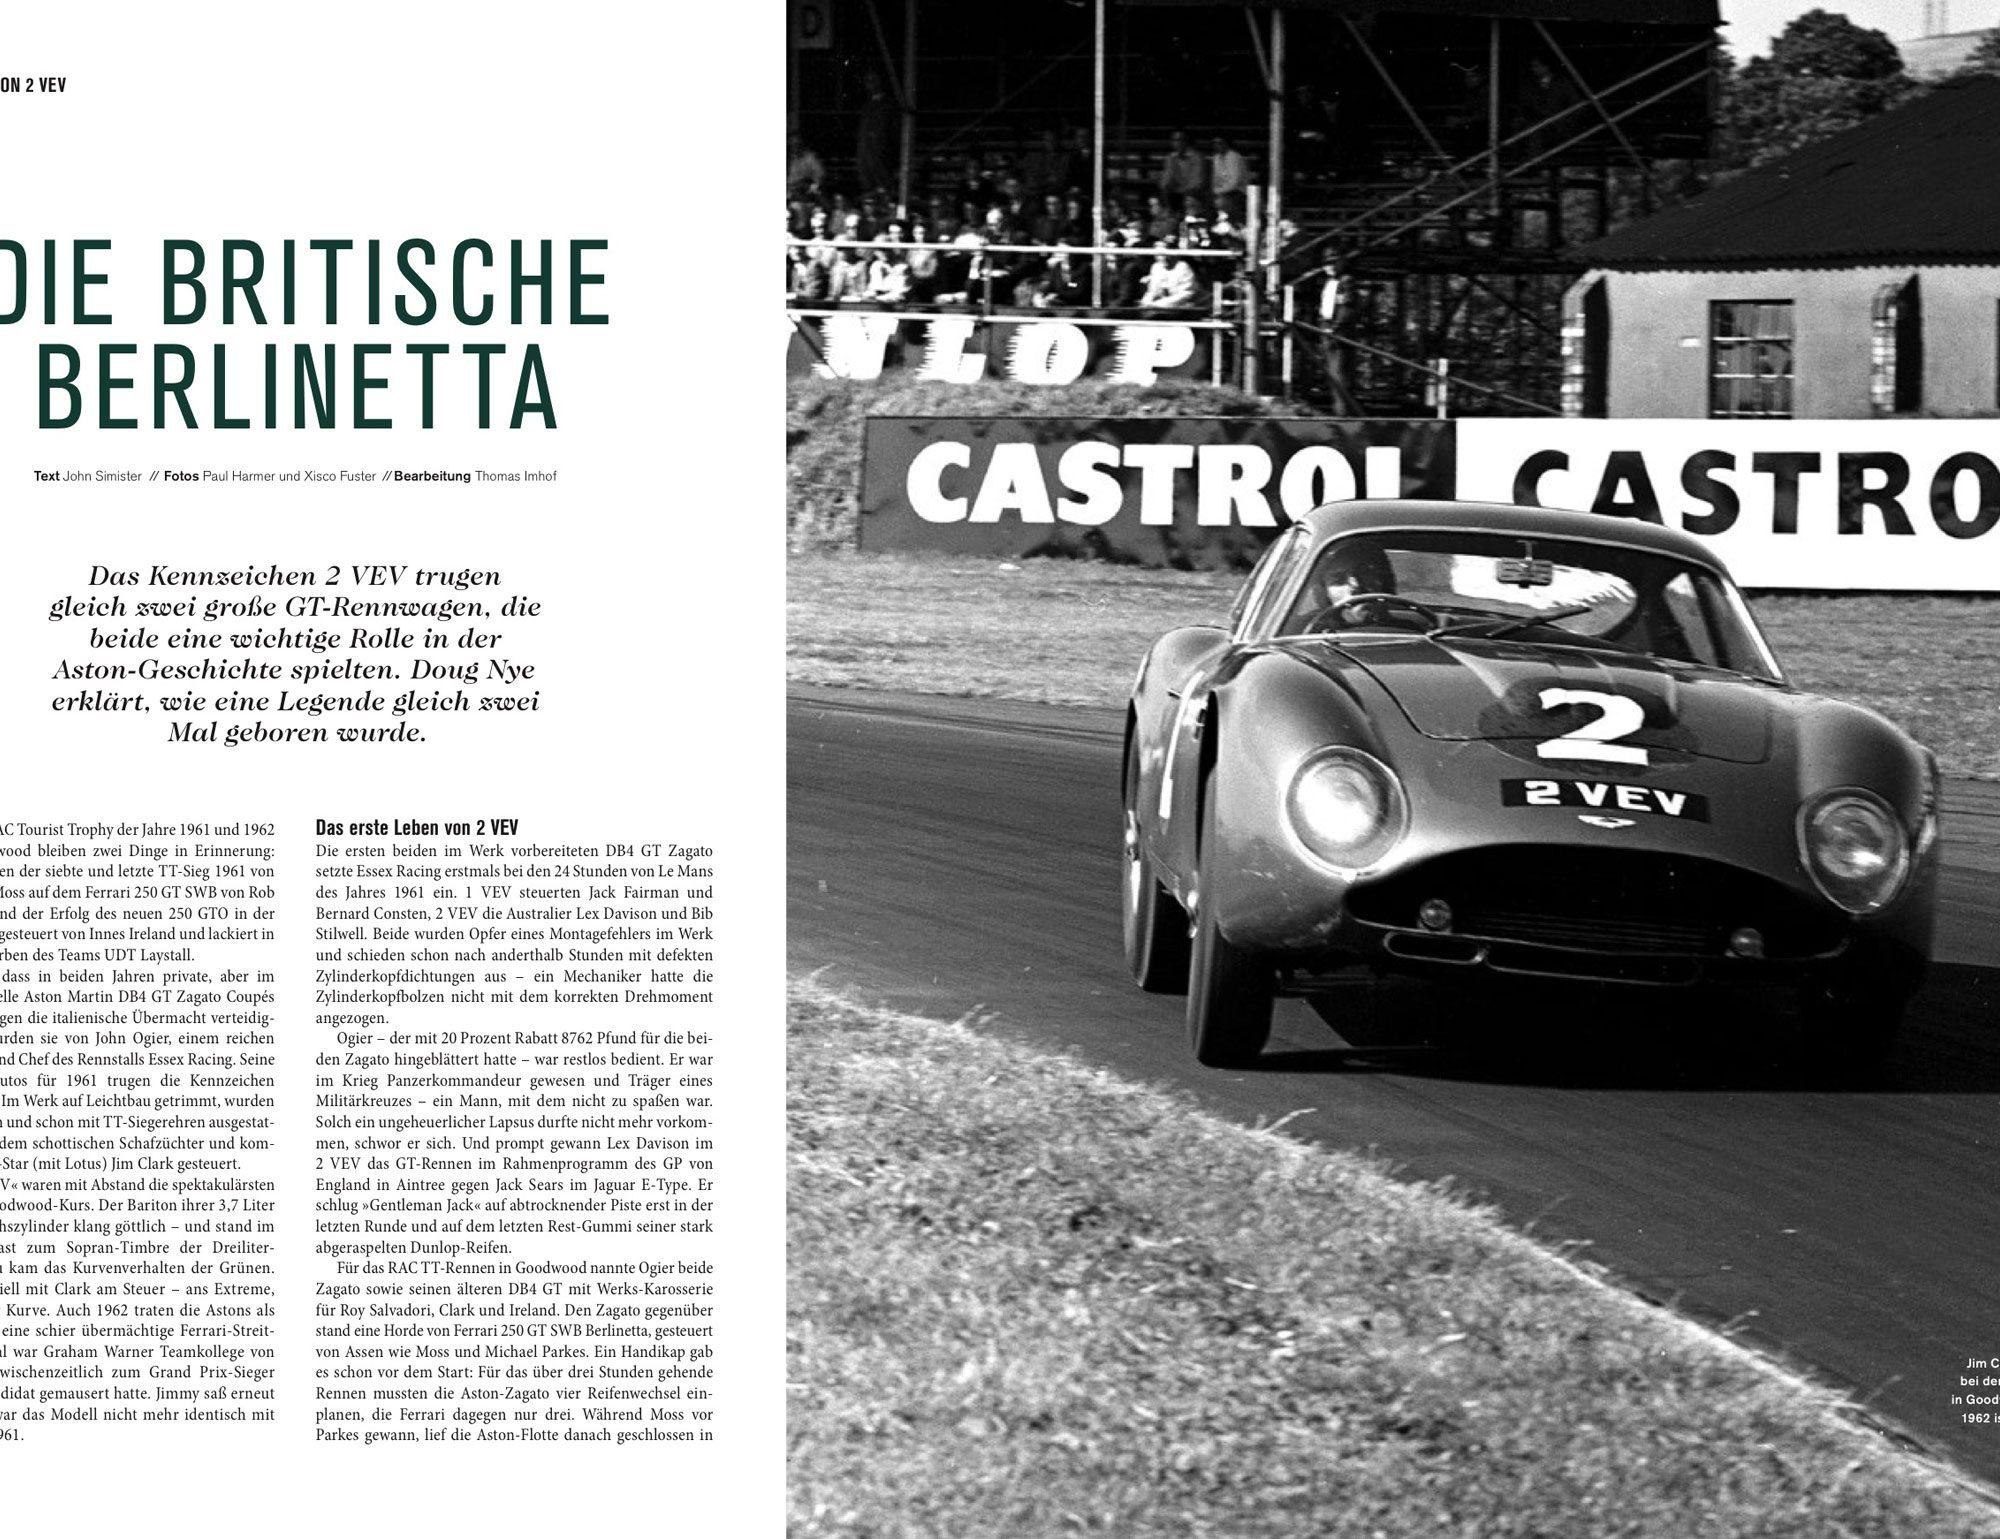 Octane, #37, Aston Martin, Lancia Rallyewagen, Bugatti Type 57C, Reifentest, Jochen Mass, Alfa Romeo Giulia Berlina, Derek Bell,